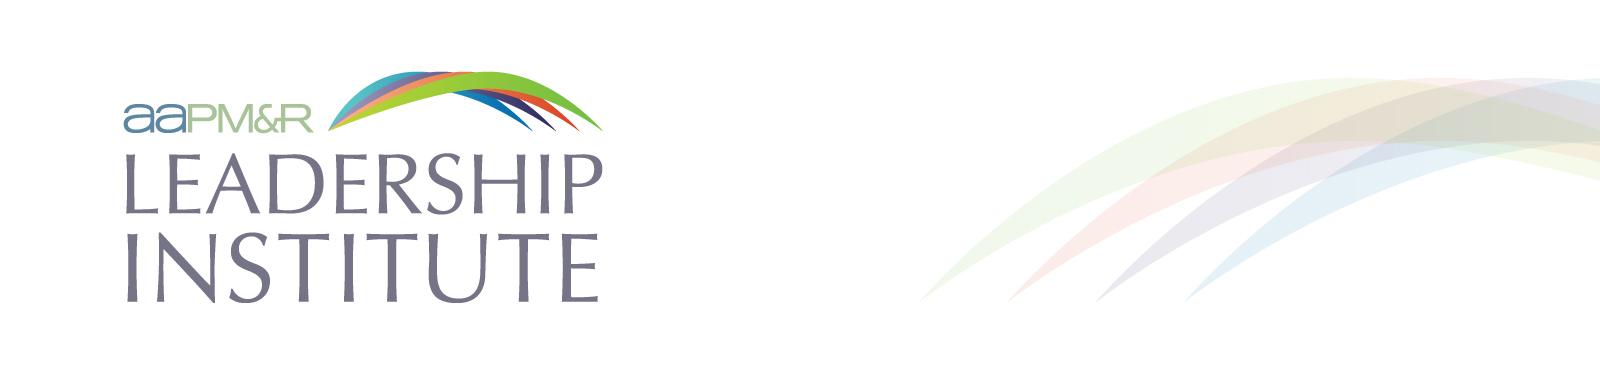 Leadership-Institute-Banner-1600x380